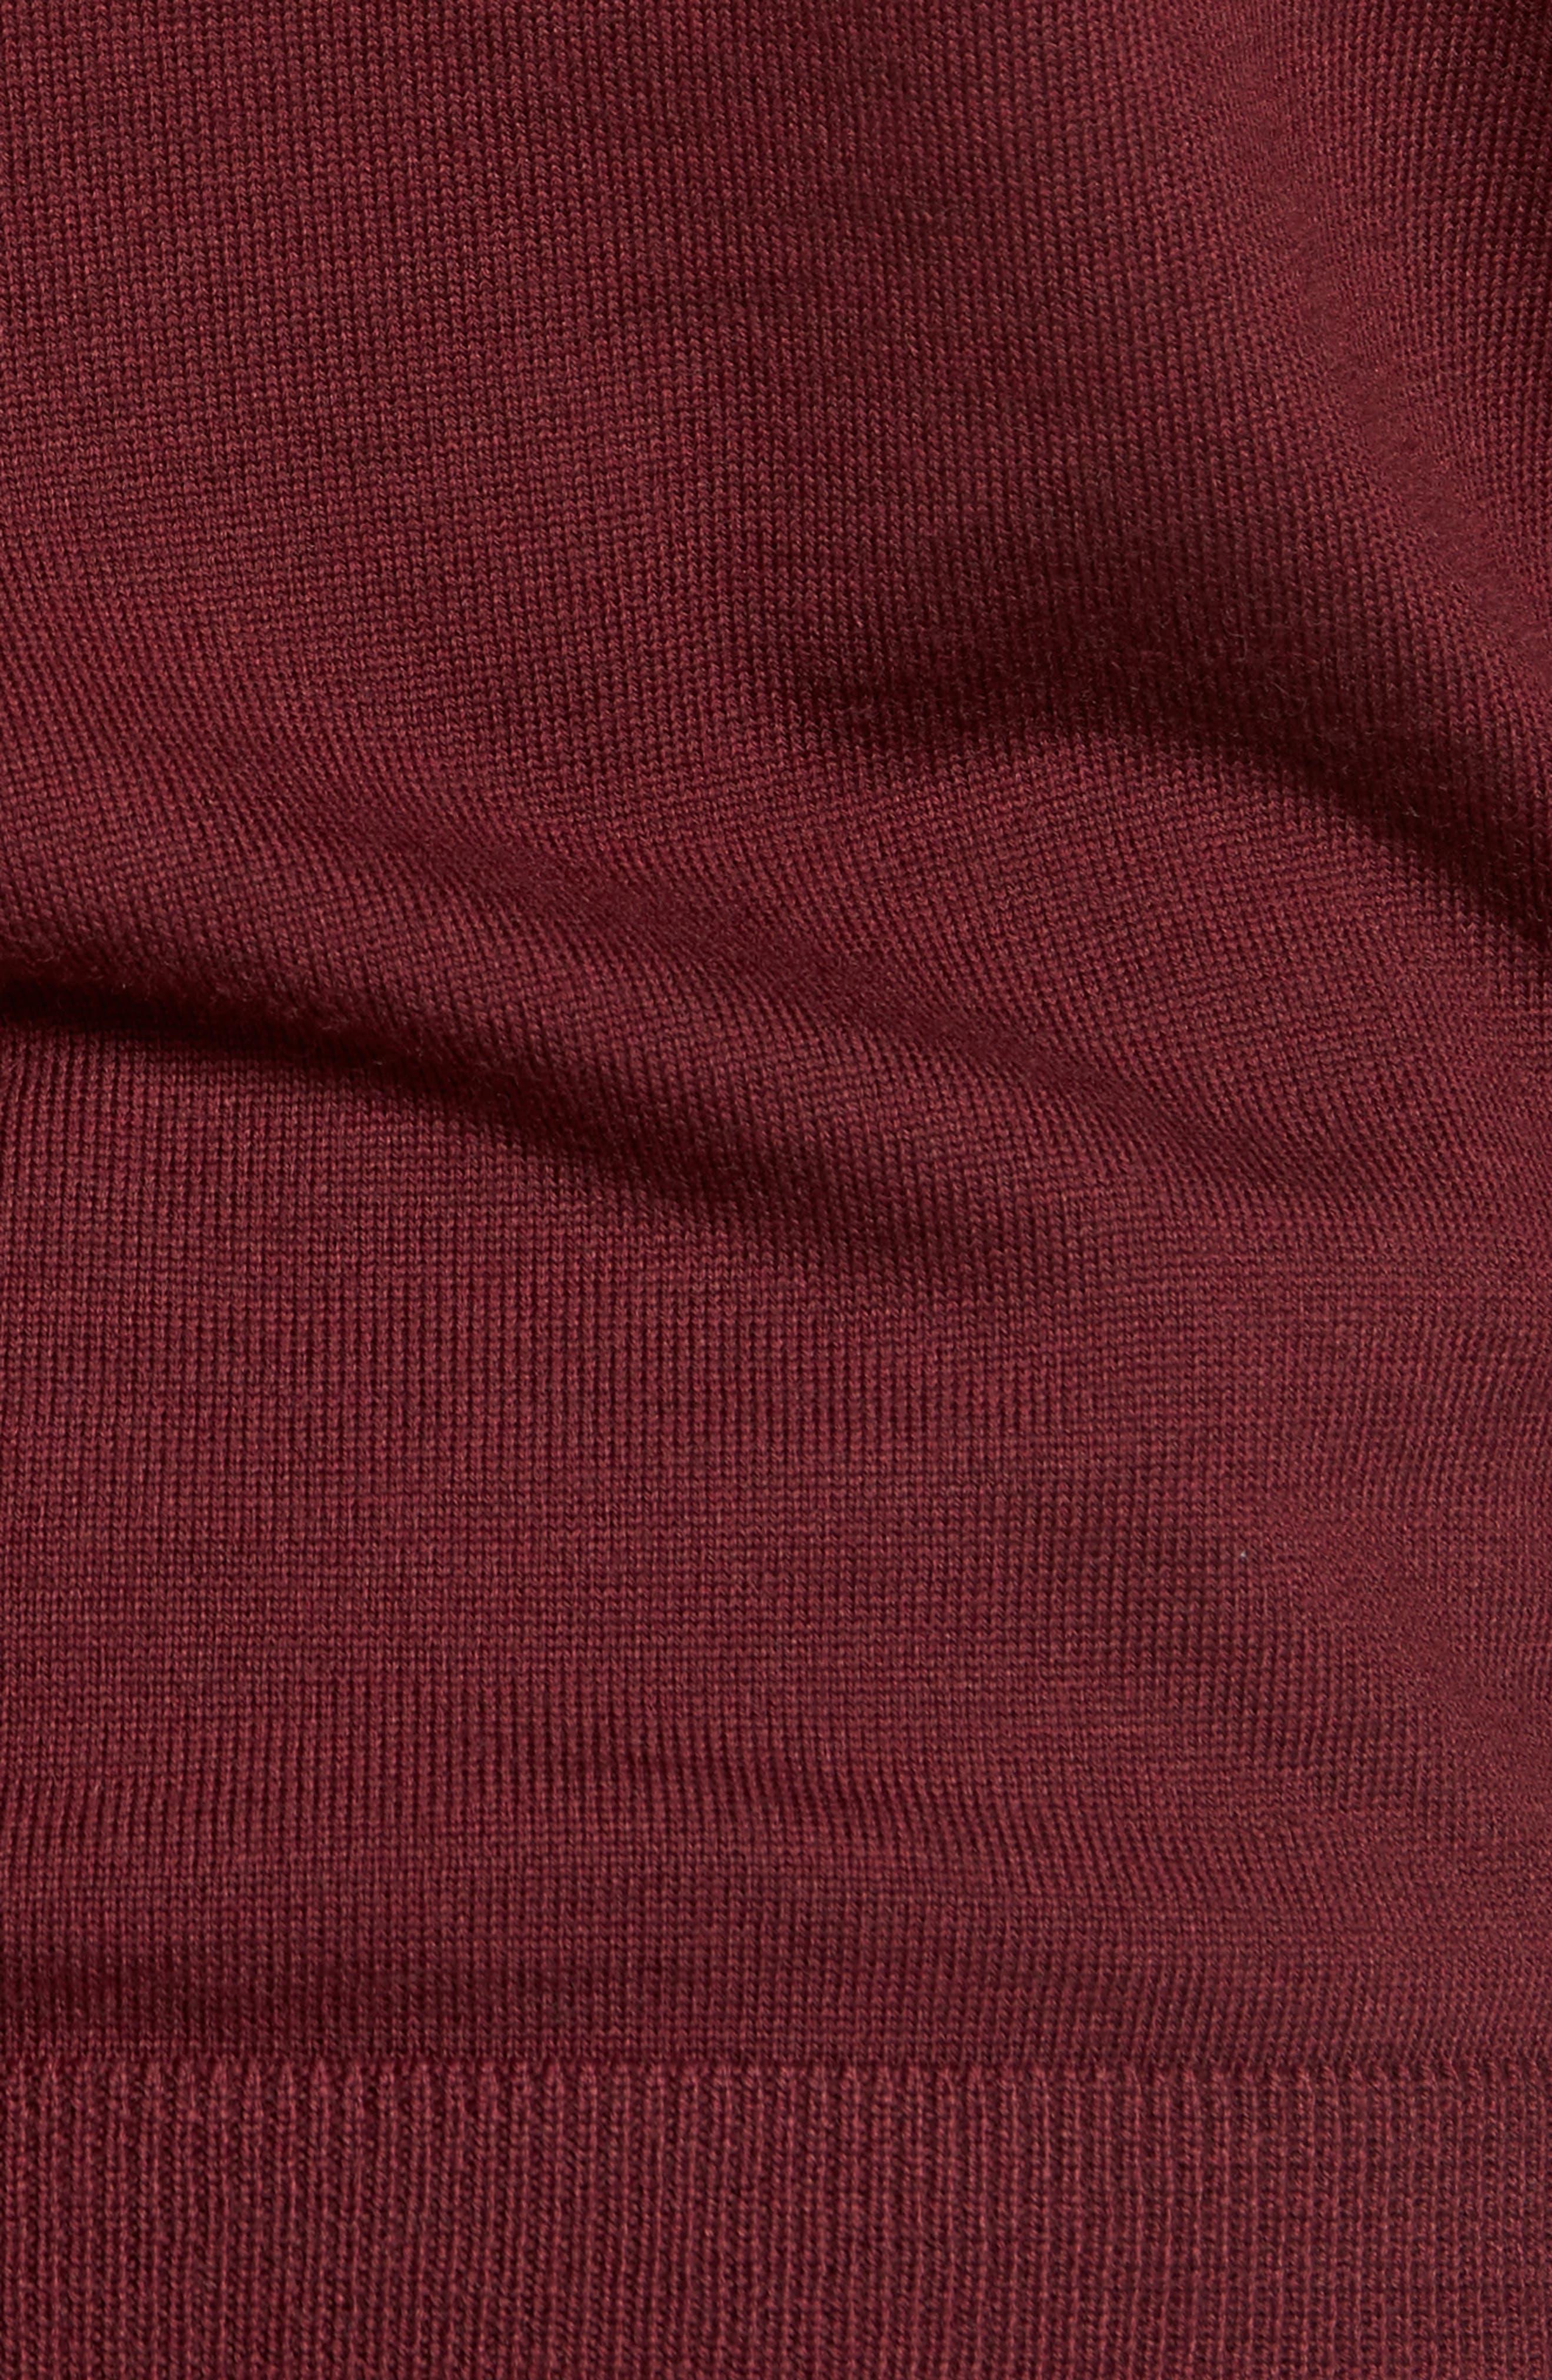 Merino Wool Turtleneck Sweater,                             Alternate thumbnail 30, color,